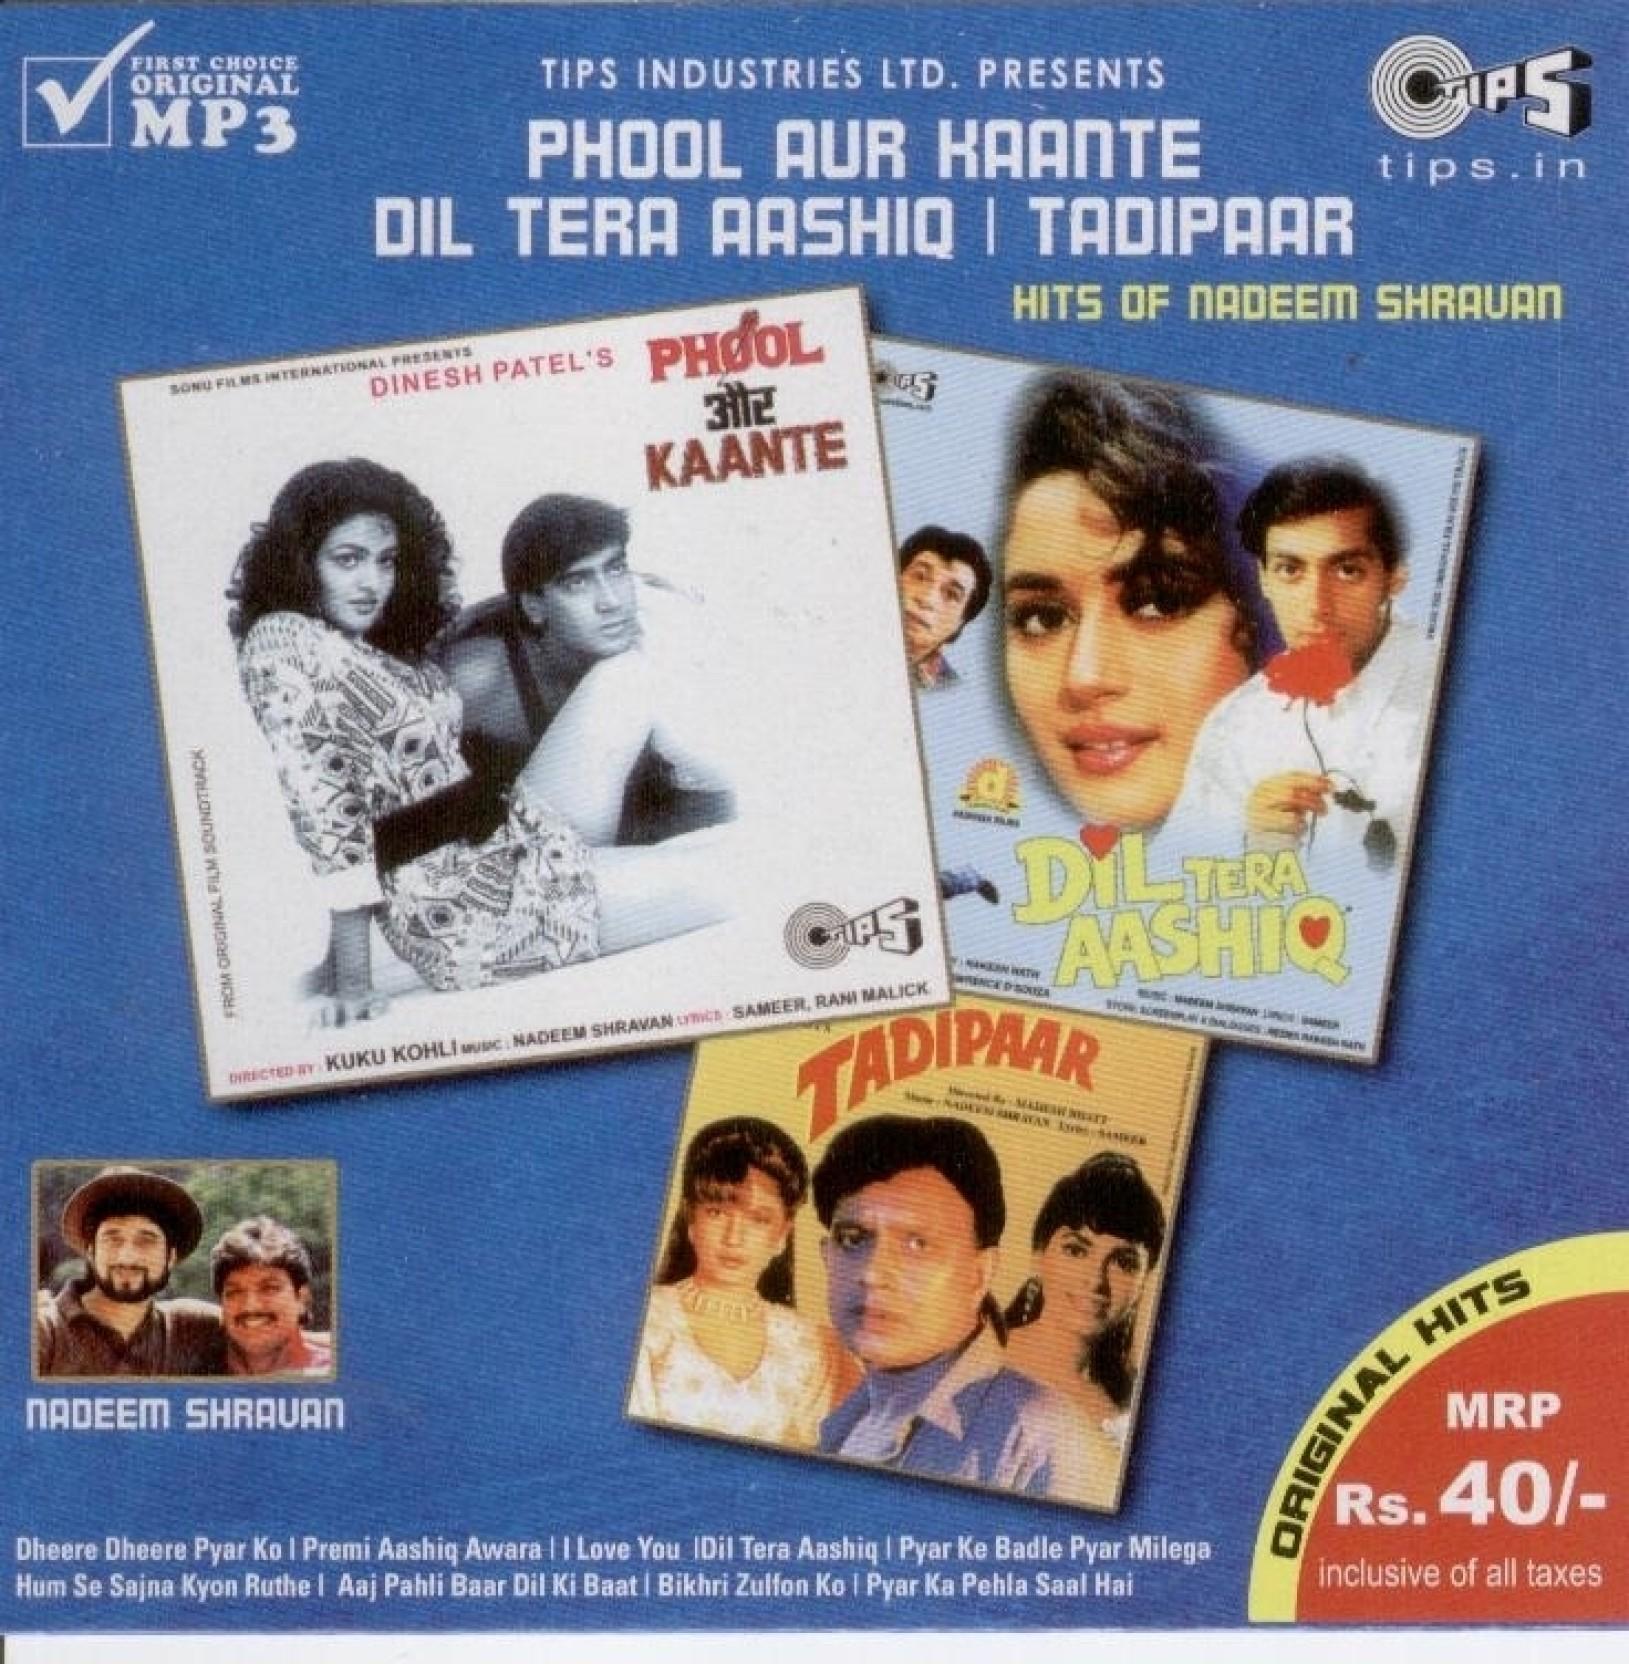 Bepanah Pyar Hai Tumse Title Song Pagalworld Download: Phool Aur Kaante / Dil Tera Aashiq / Tadipaar Music MP3